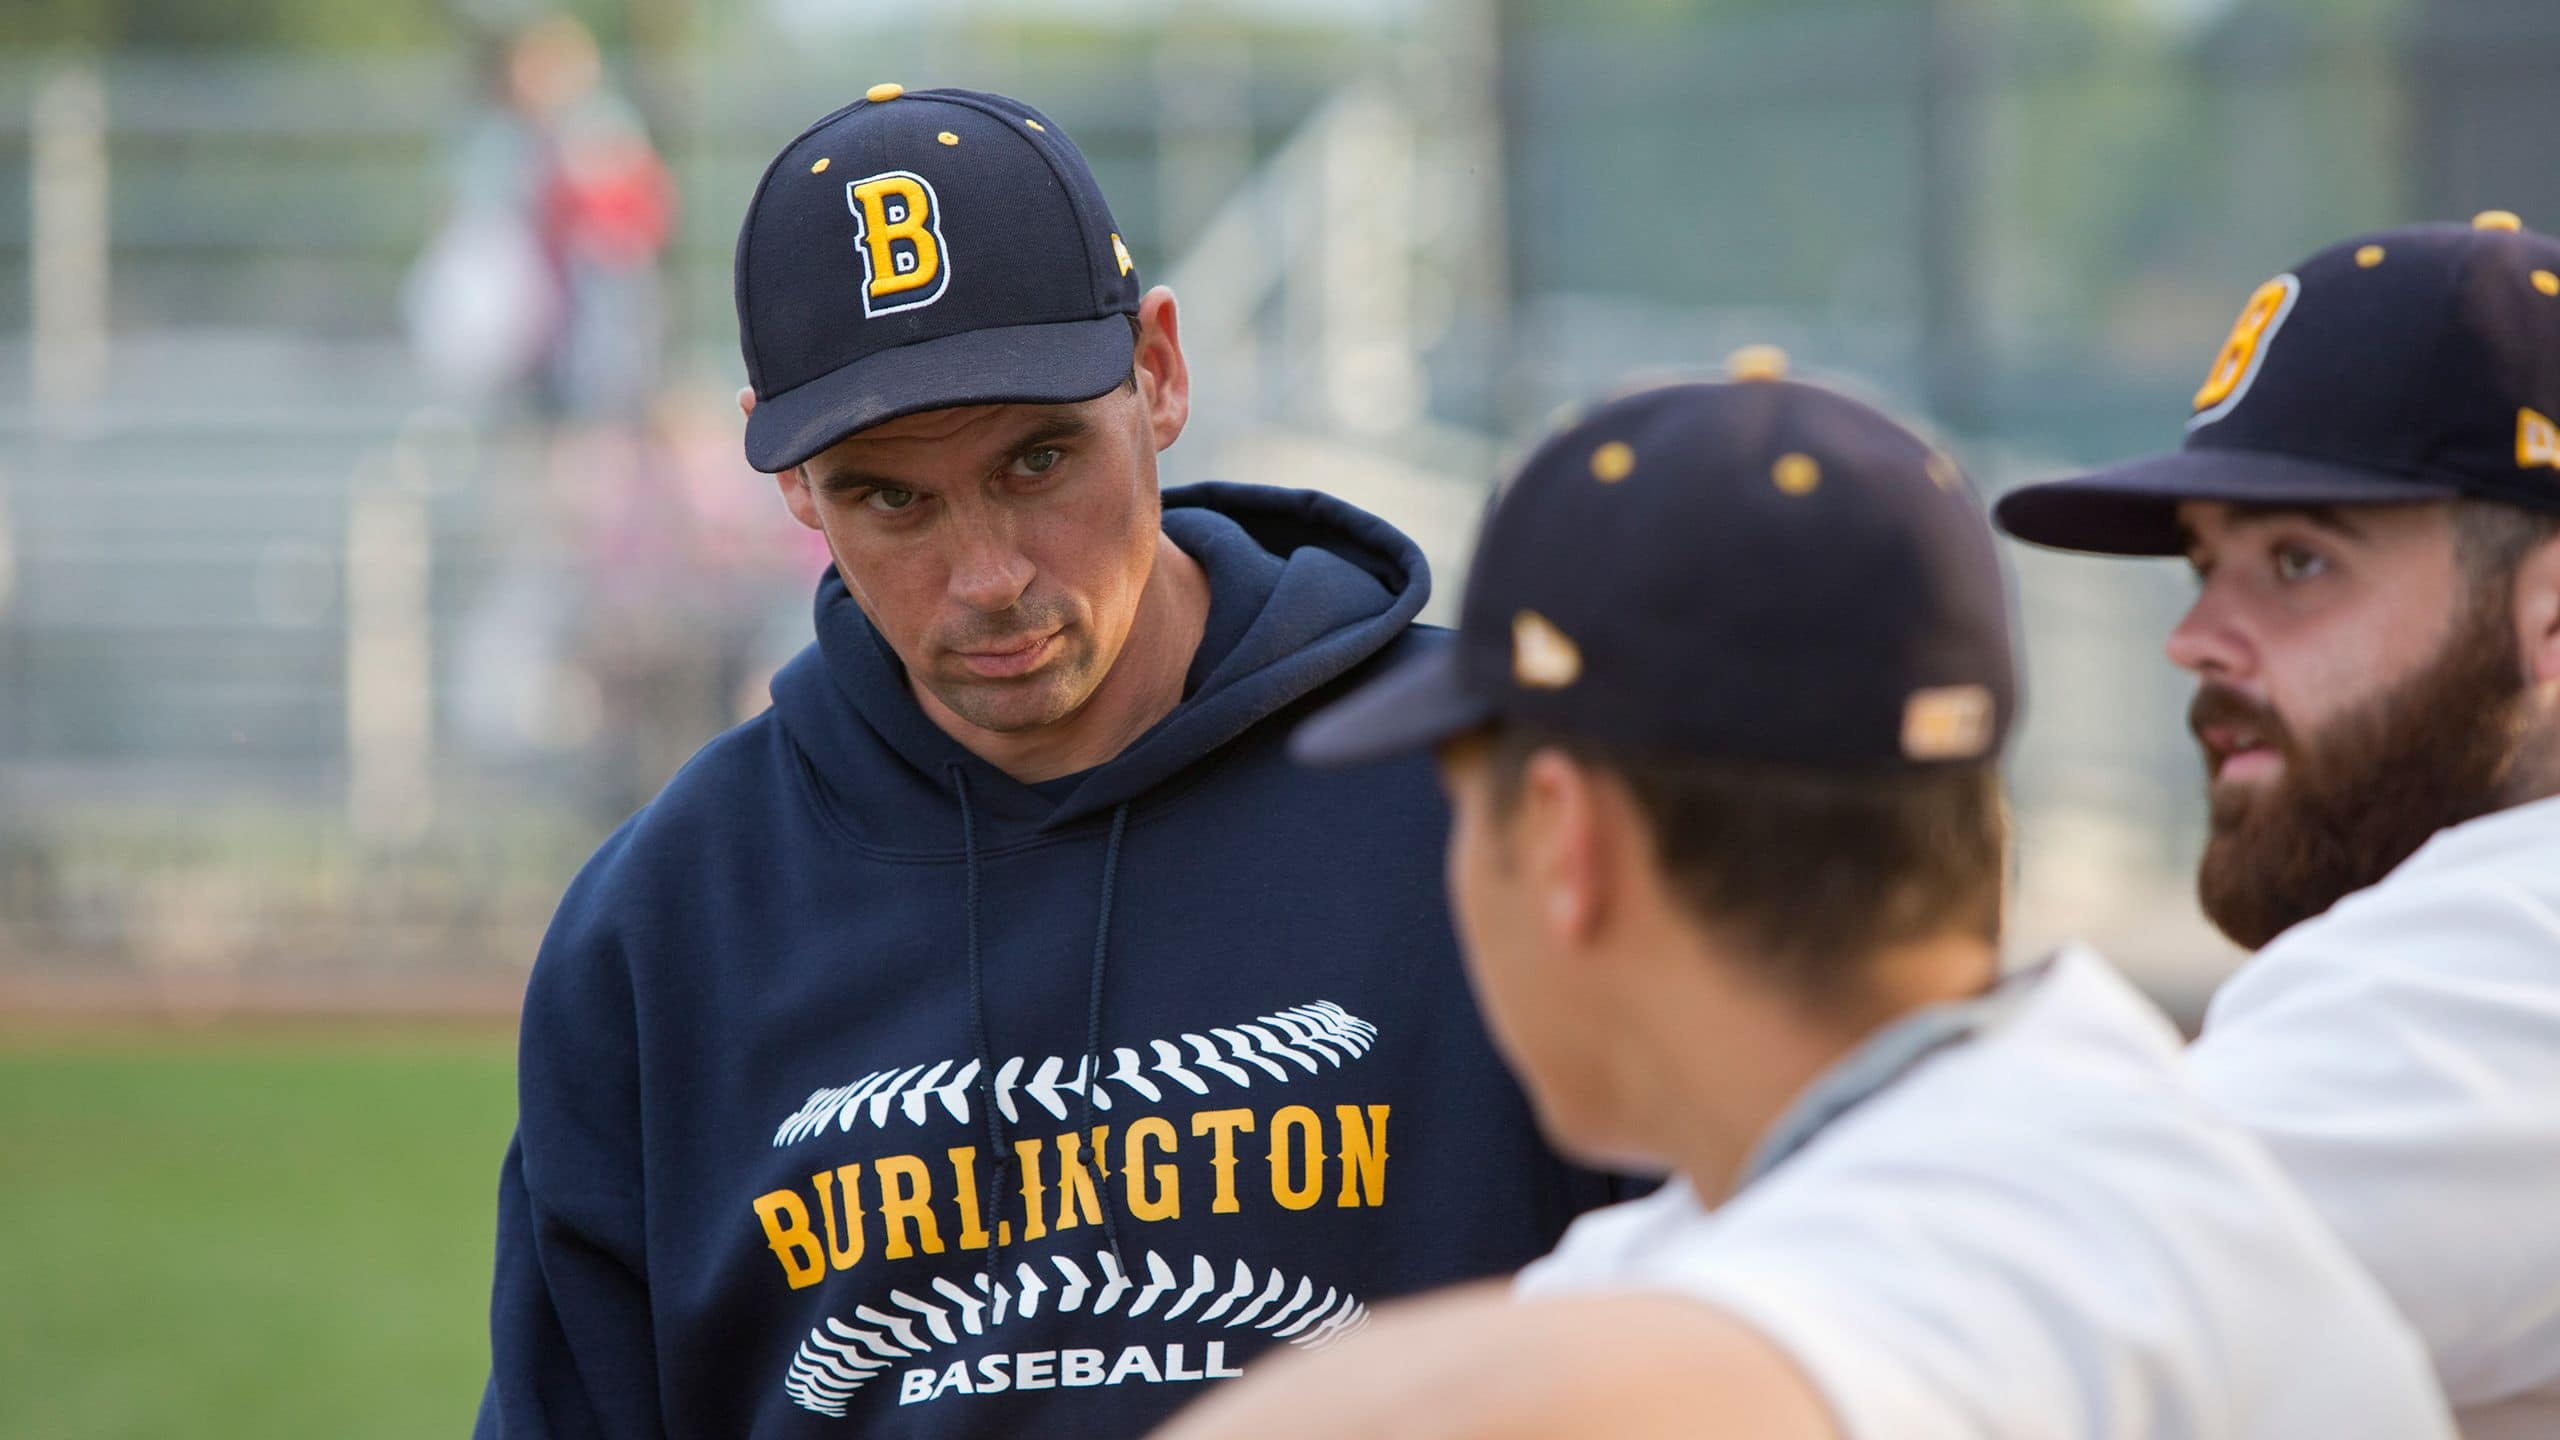 Pagan helps coach the Burlington Bulls, an under-21 team. (Evan Mitsui/CBC)